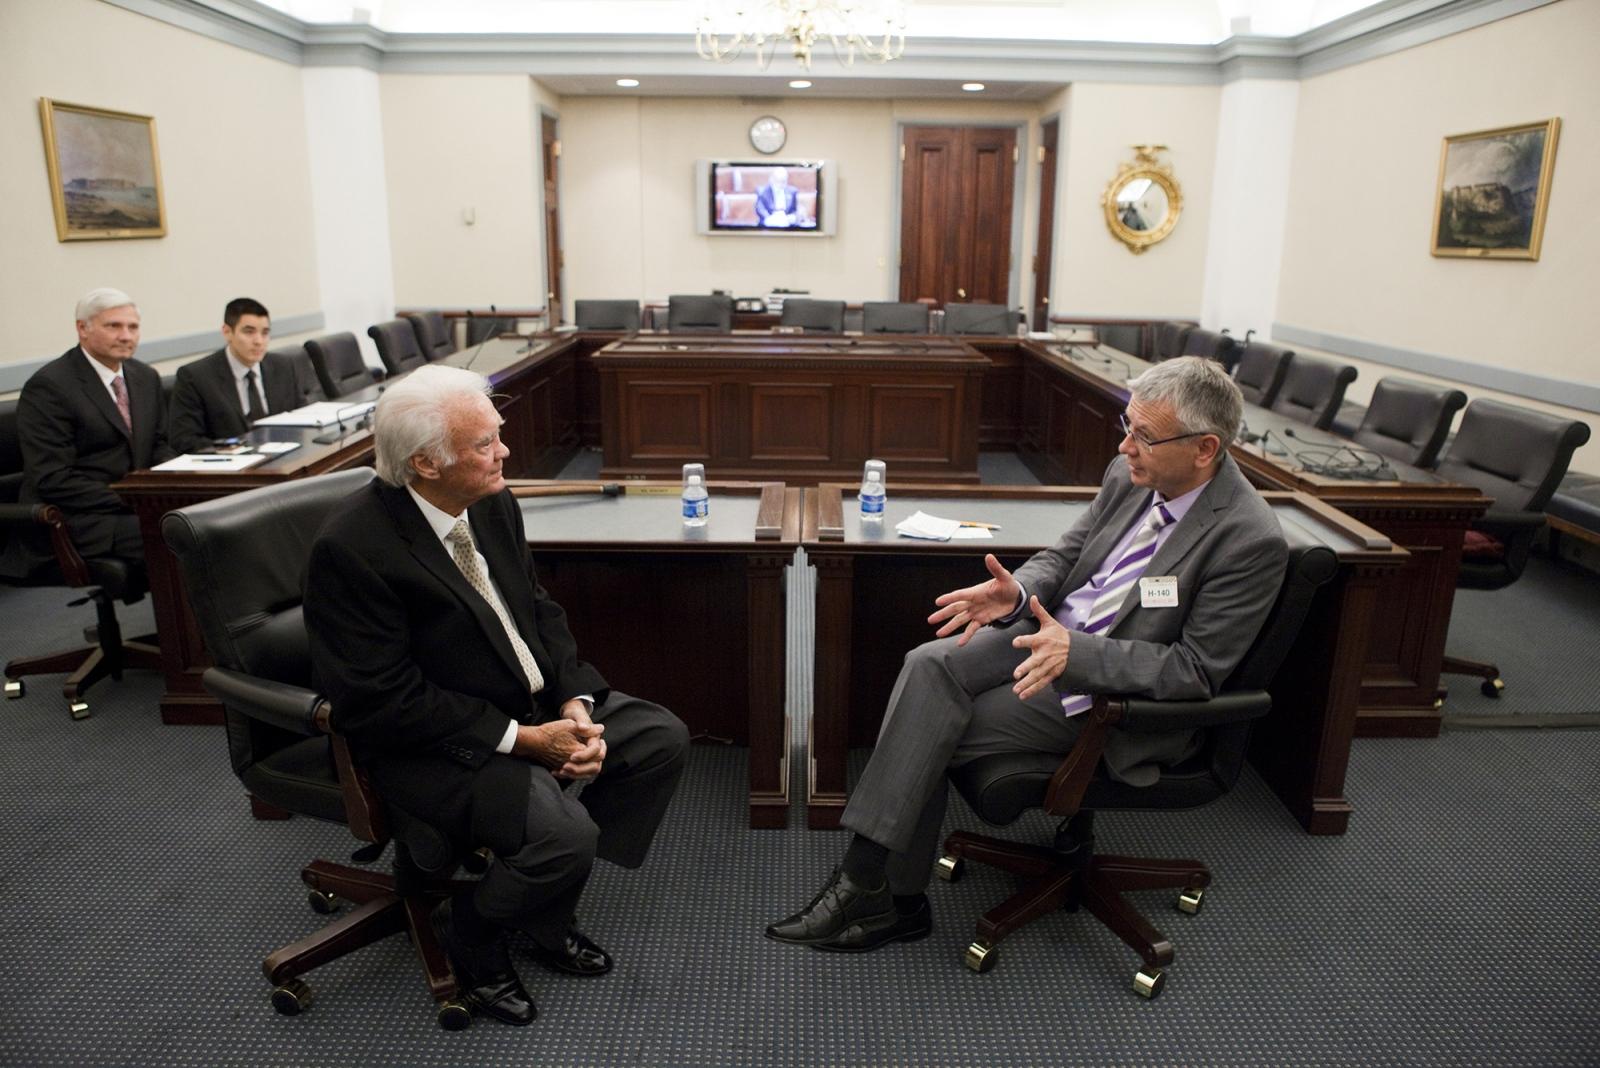 Senator Thad Cochran talks withLord Mayor Dr. Klaus Weichel ofKaiserslautern, Germany.